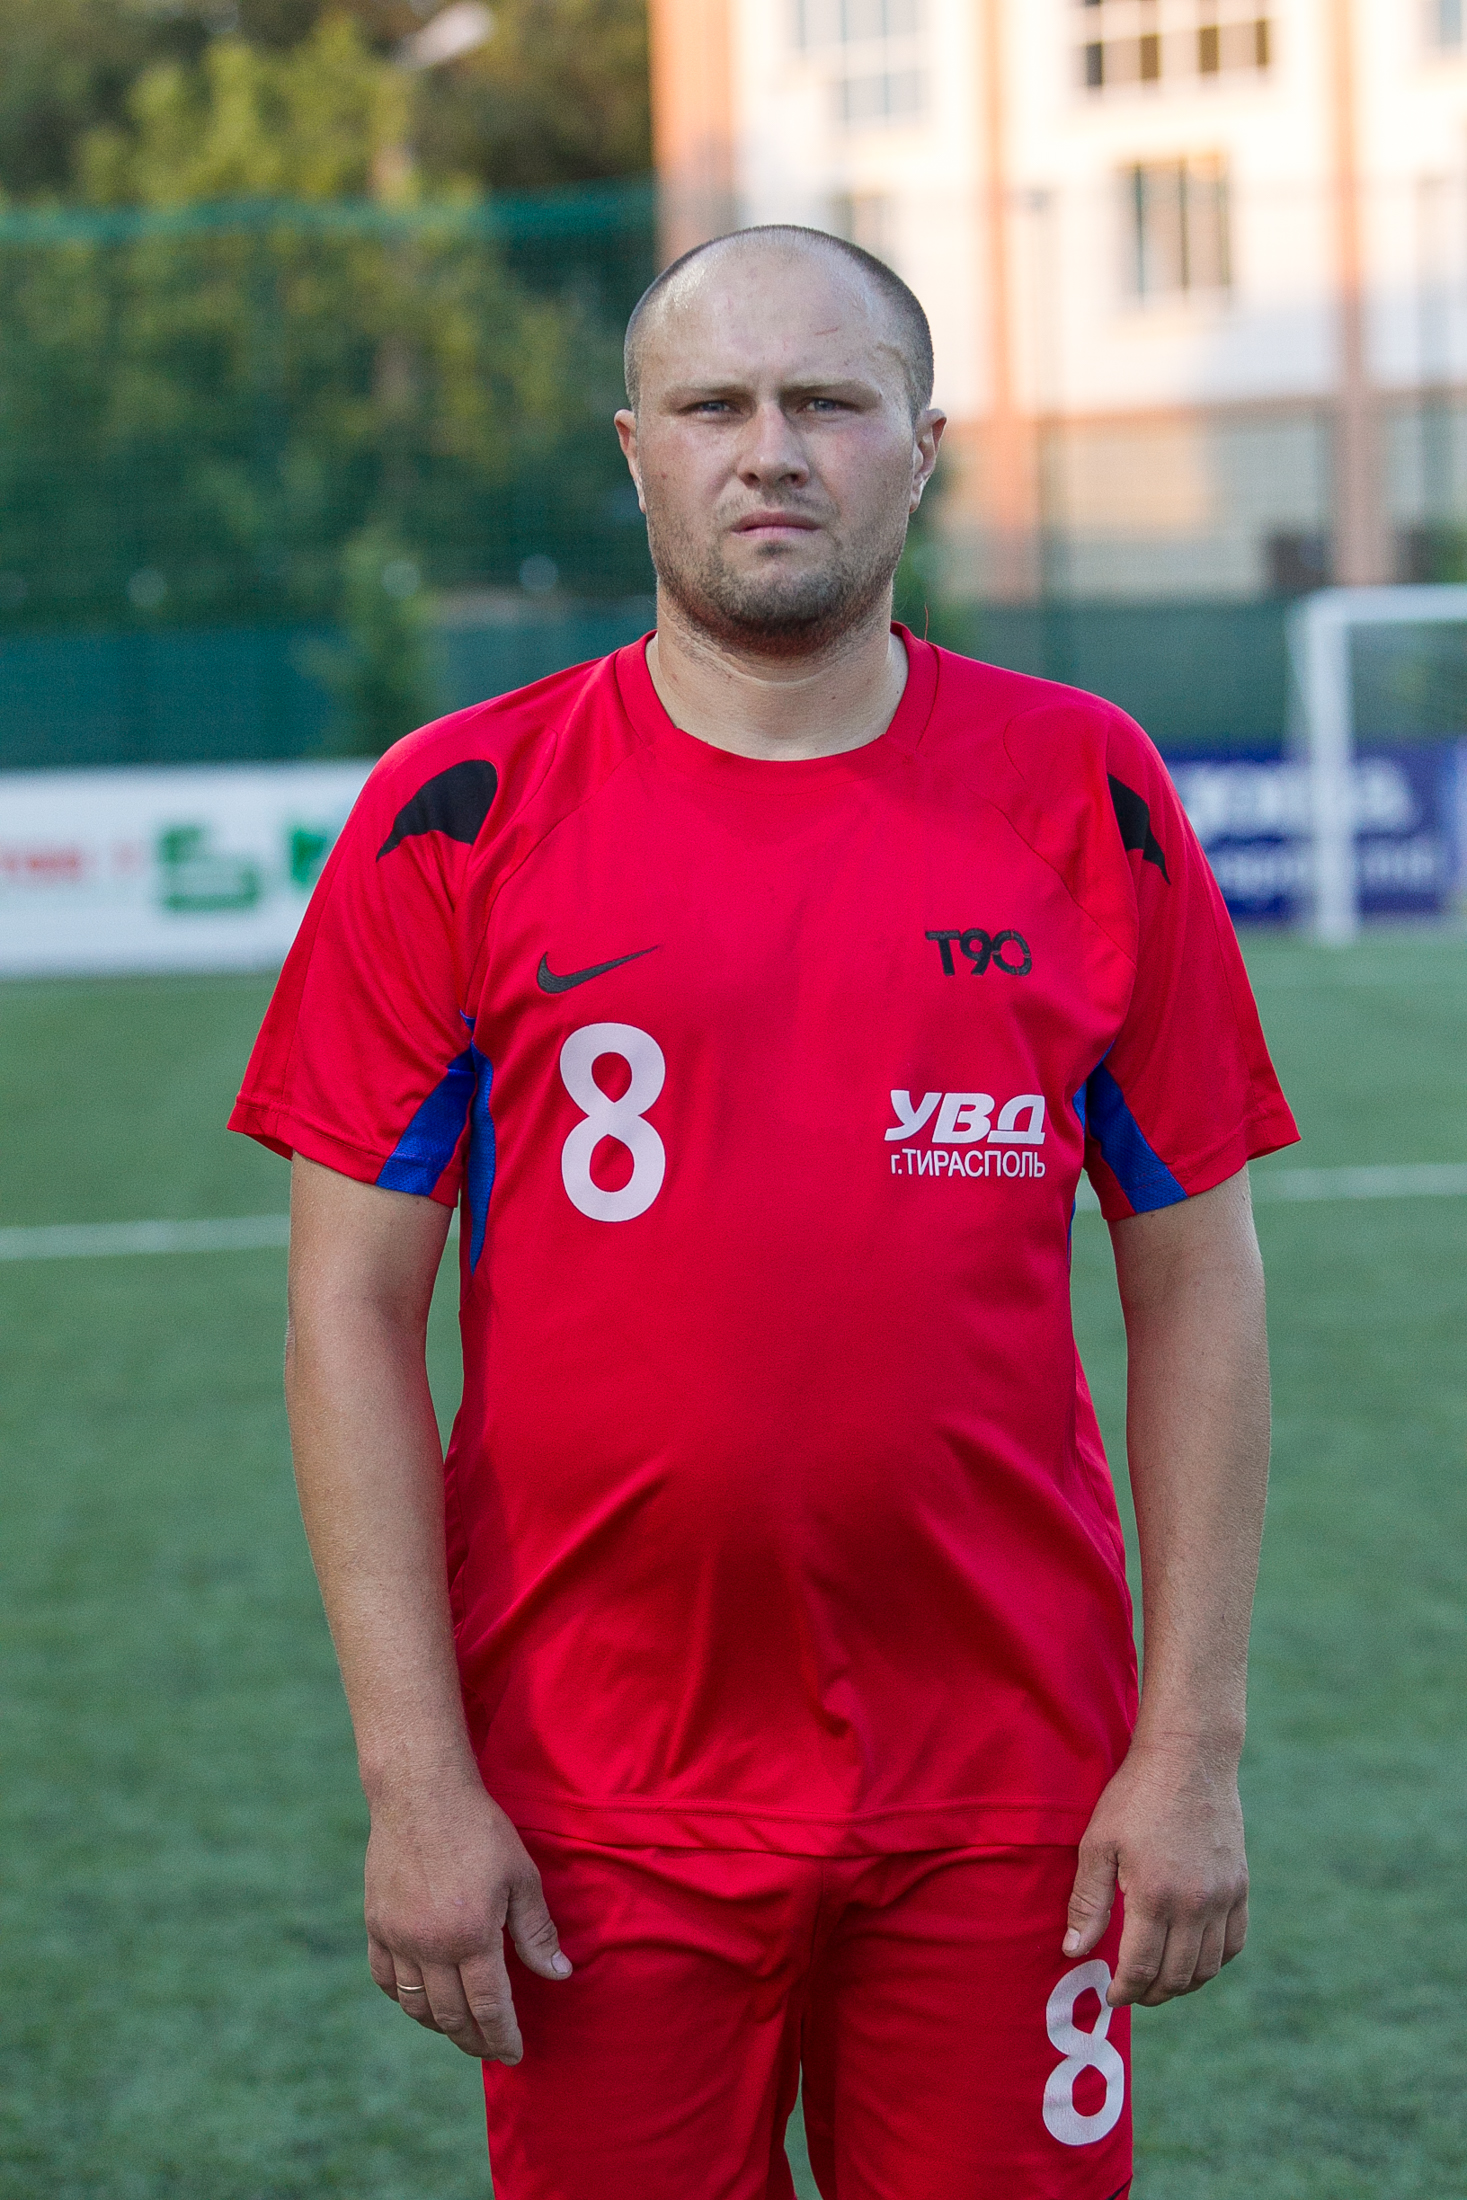 Руденко Дмитрий